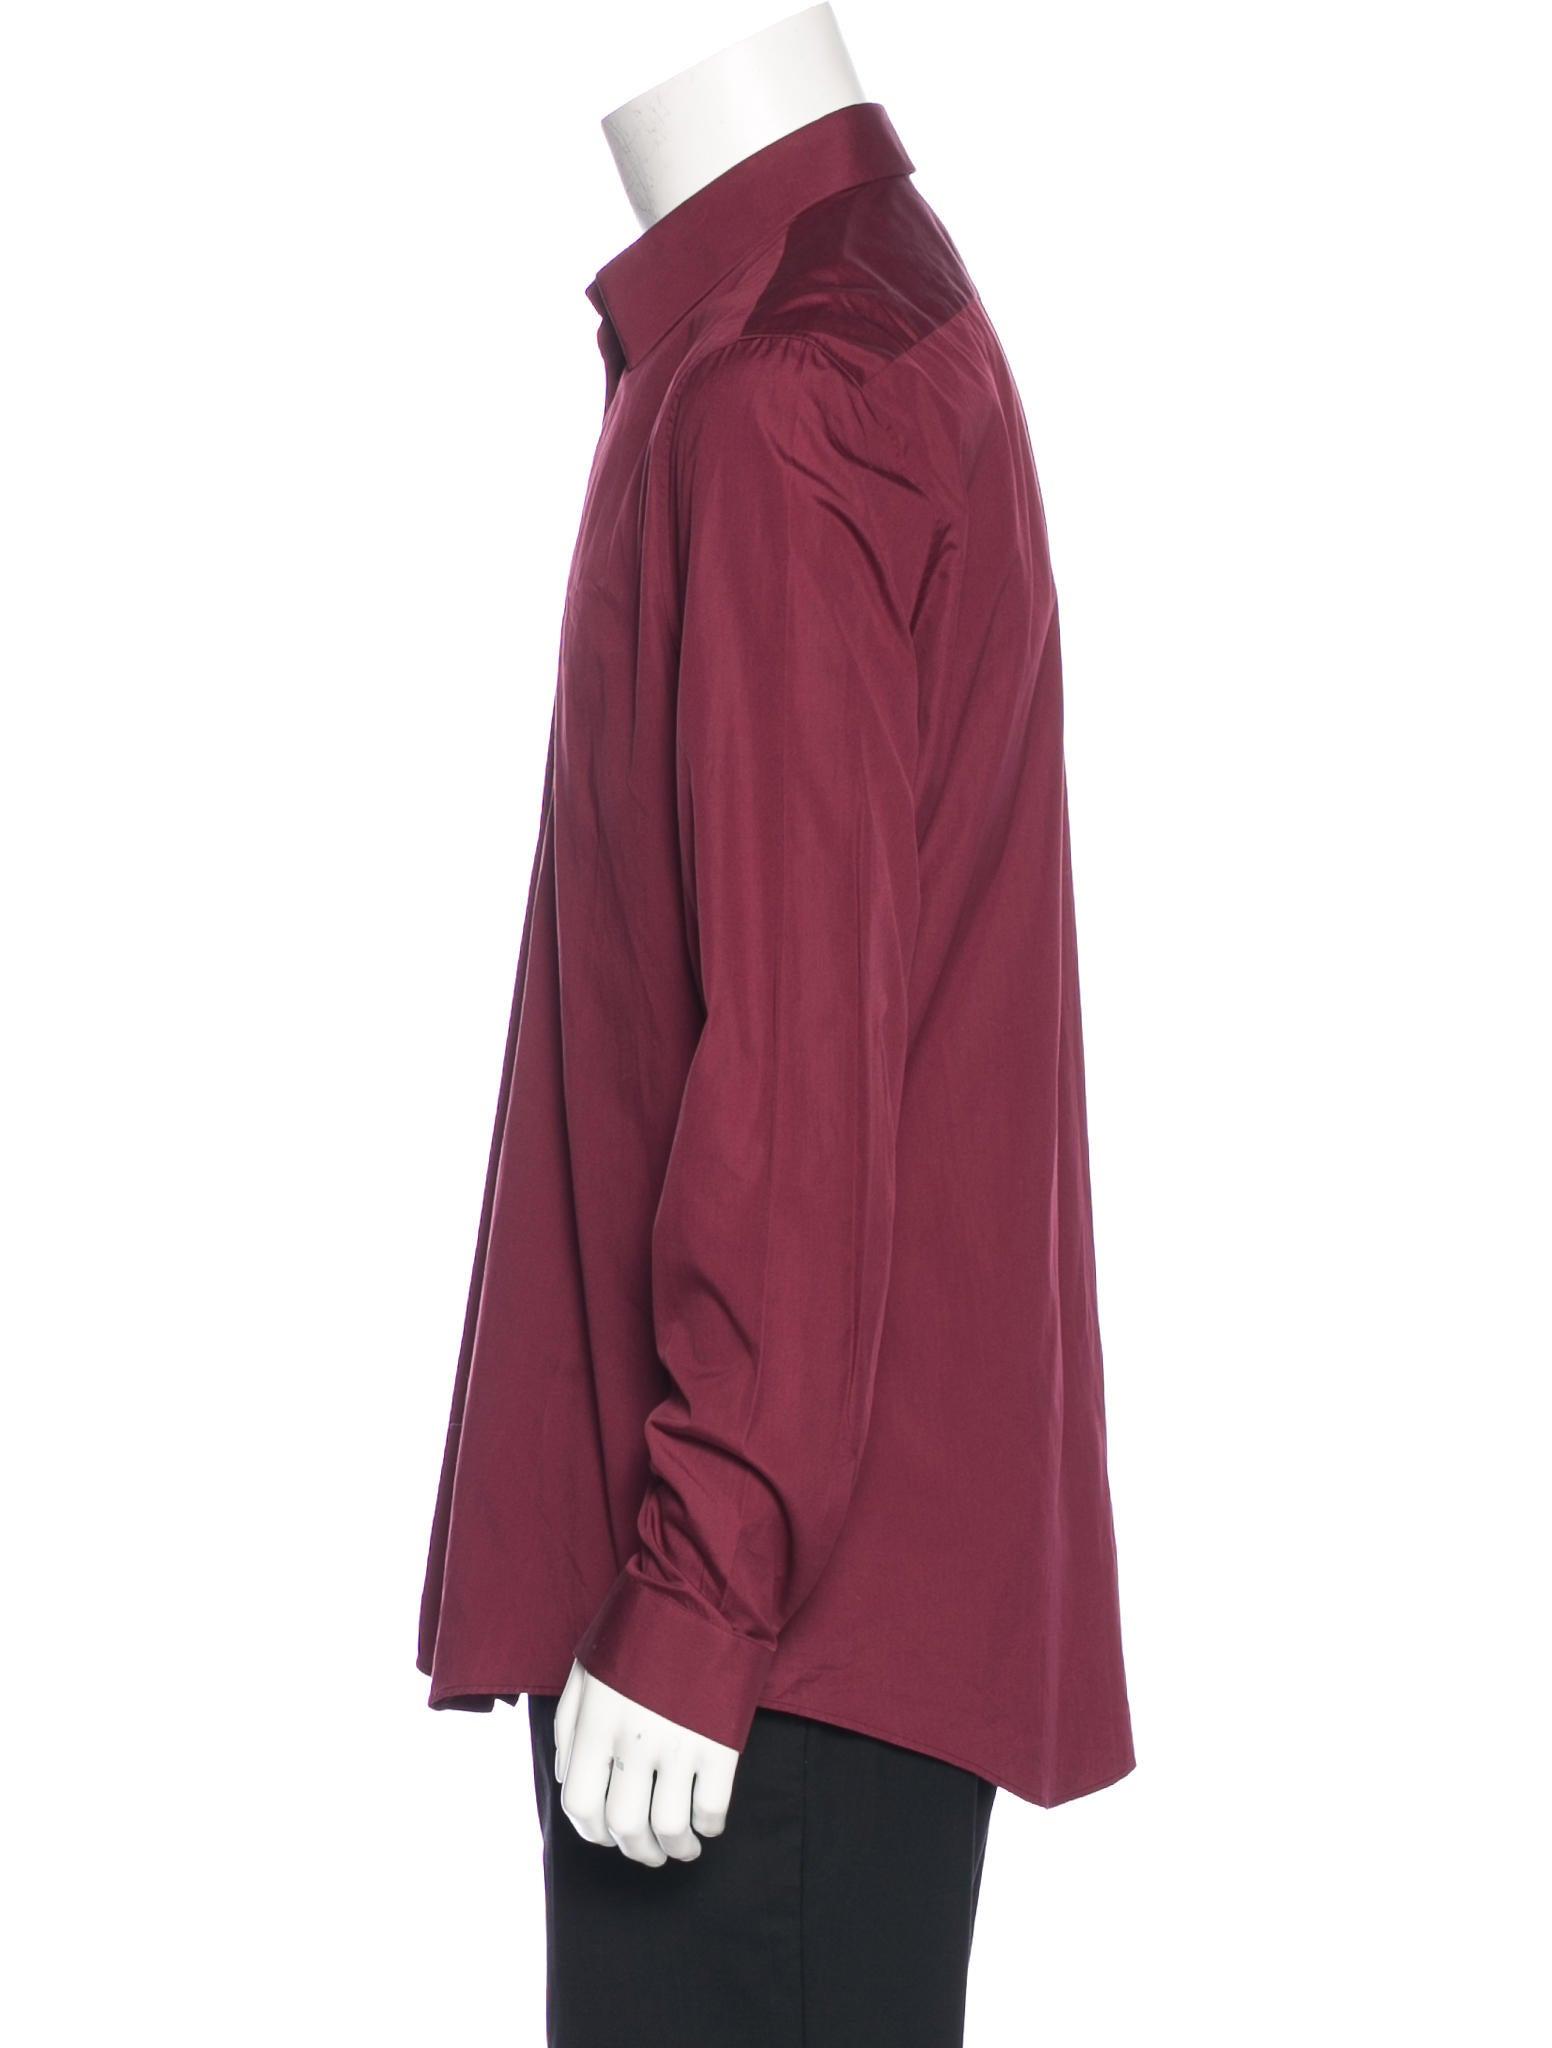 Balenciaga woven dress shirt w tags clothing bal53420 Woven t shirt tags